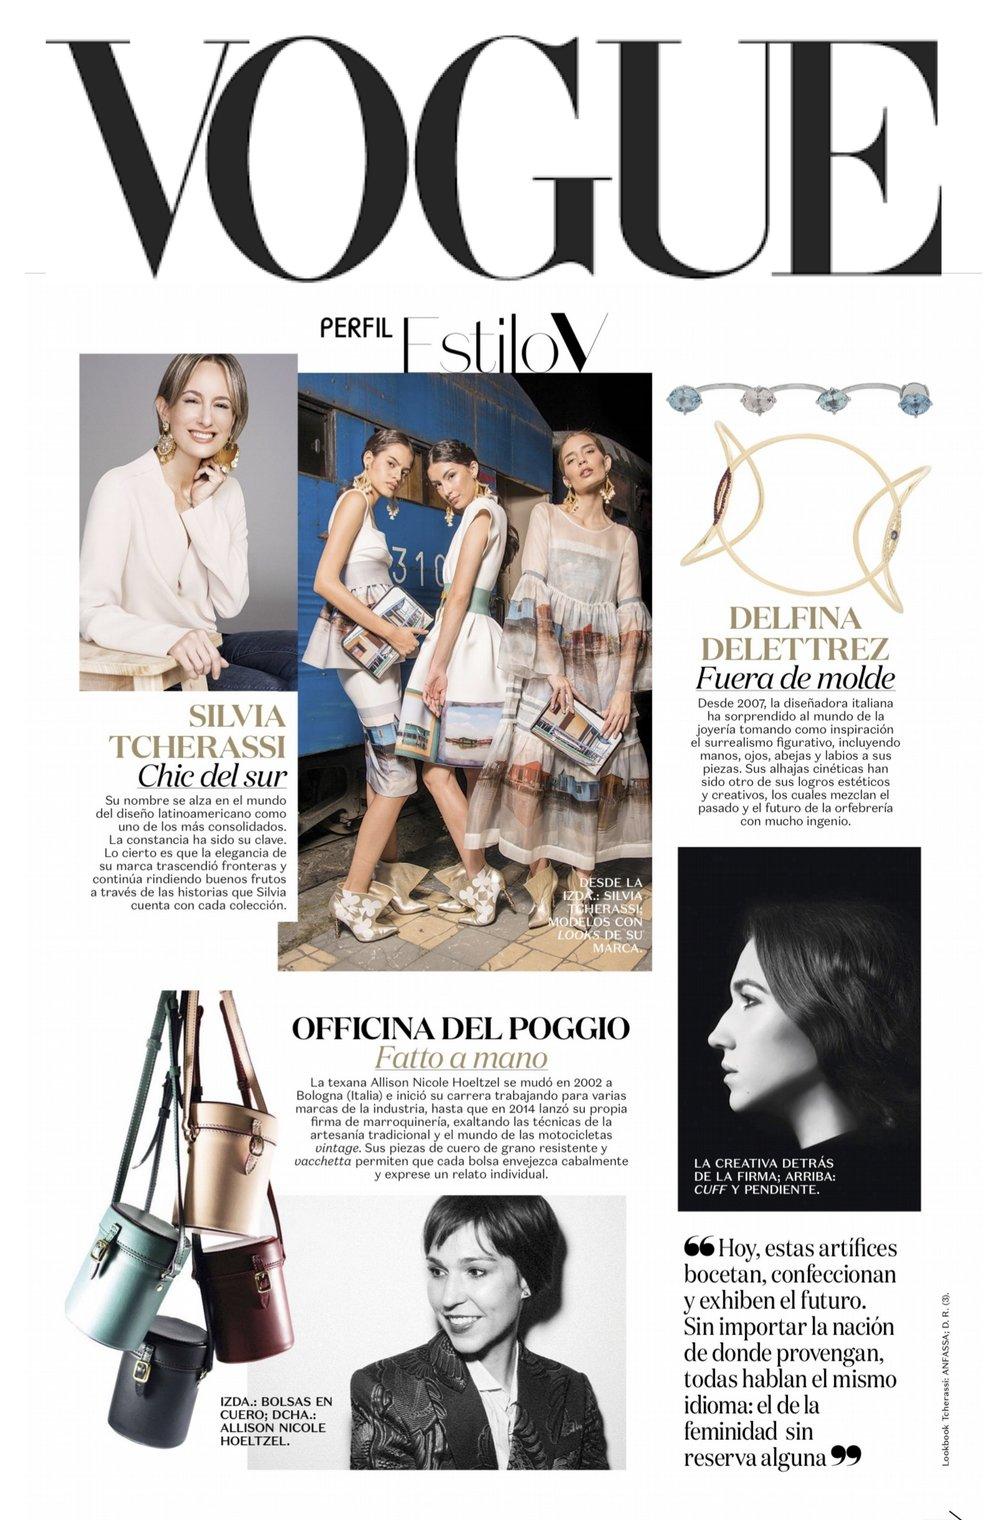 Vogue-Messico-Officina-del-Poggio (1).jpg